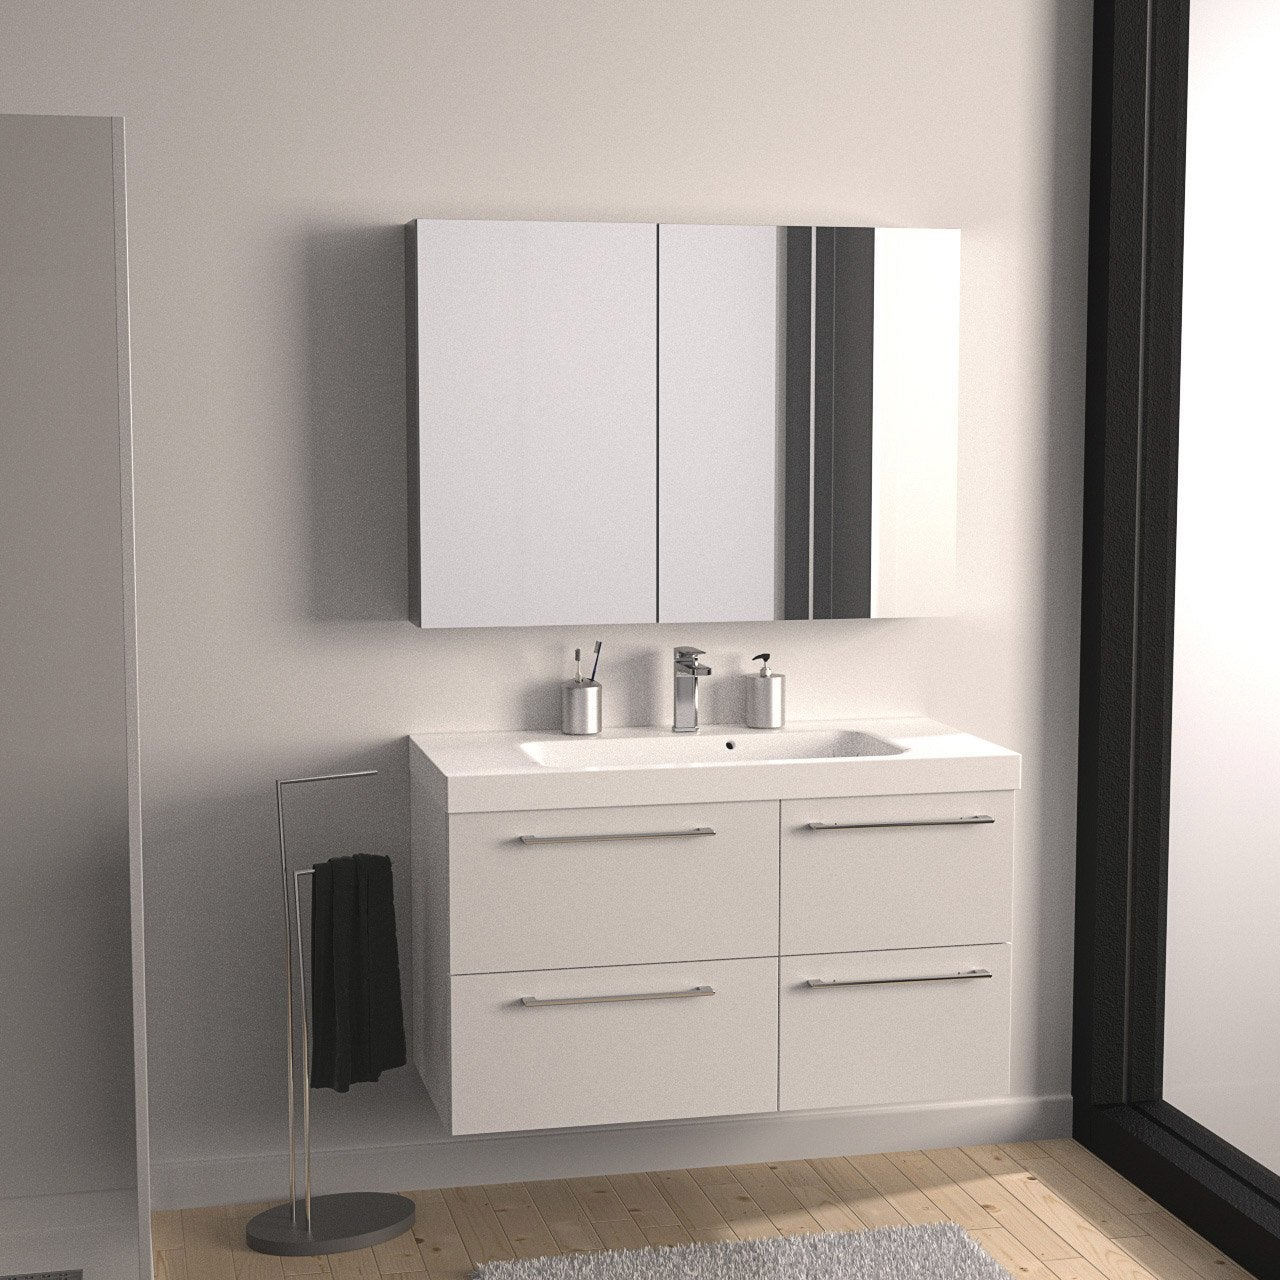 Meuble vasque x x cm blanc sensea for Meuble vasque leroy merlin